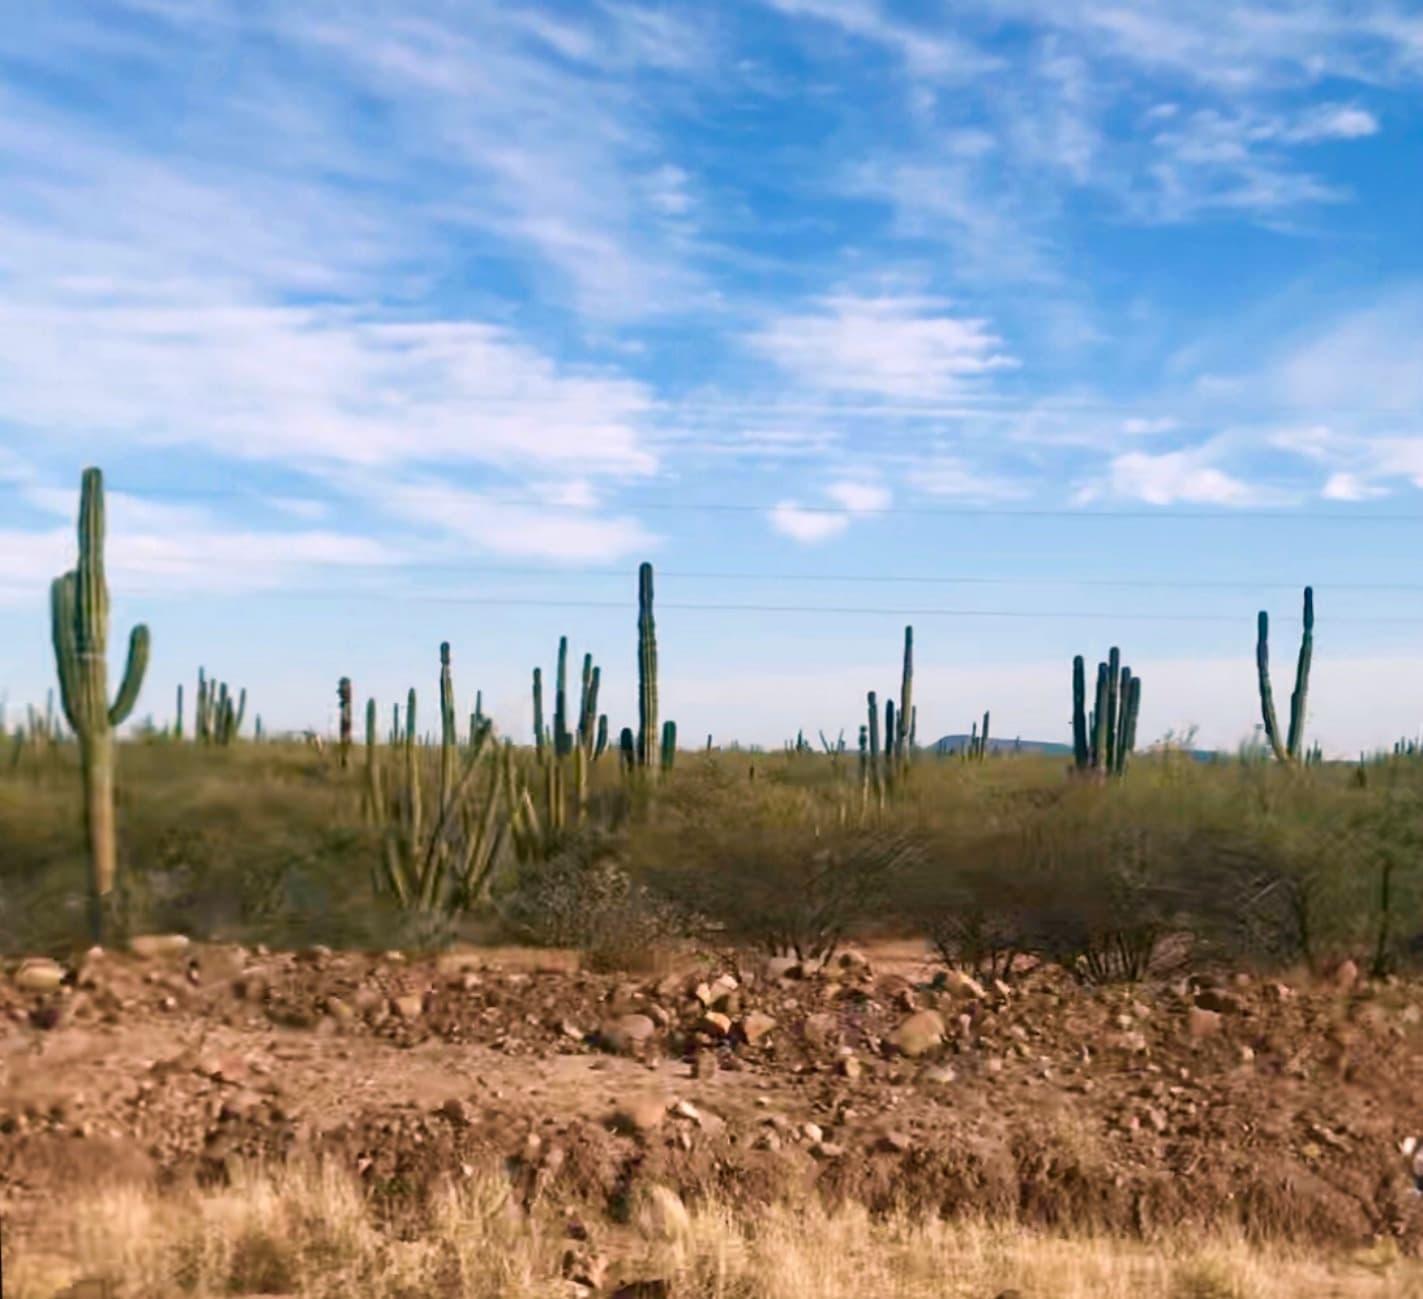 Sagura and cardon Cactus in Baja Mexico